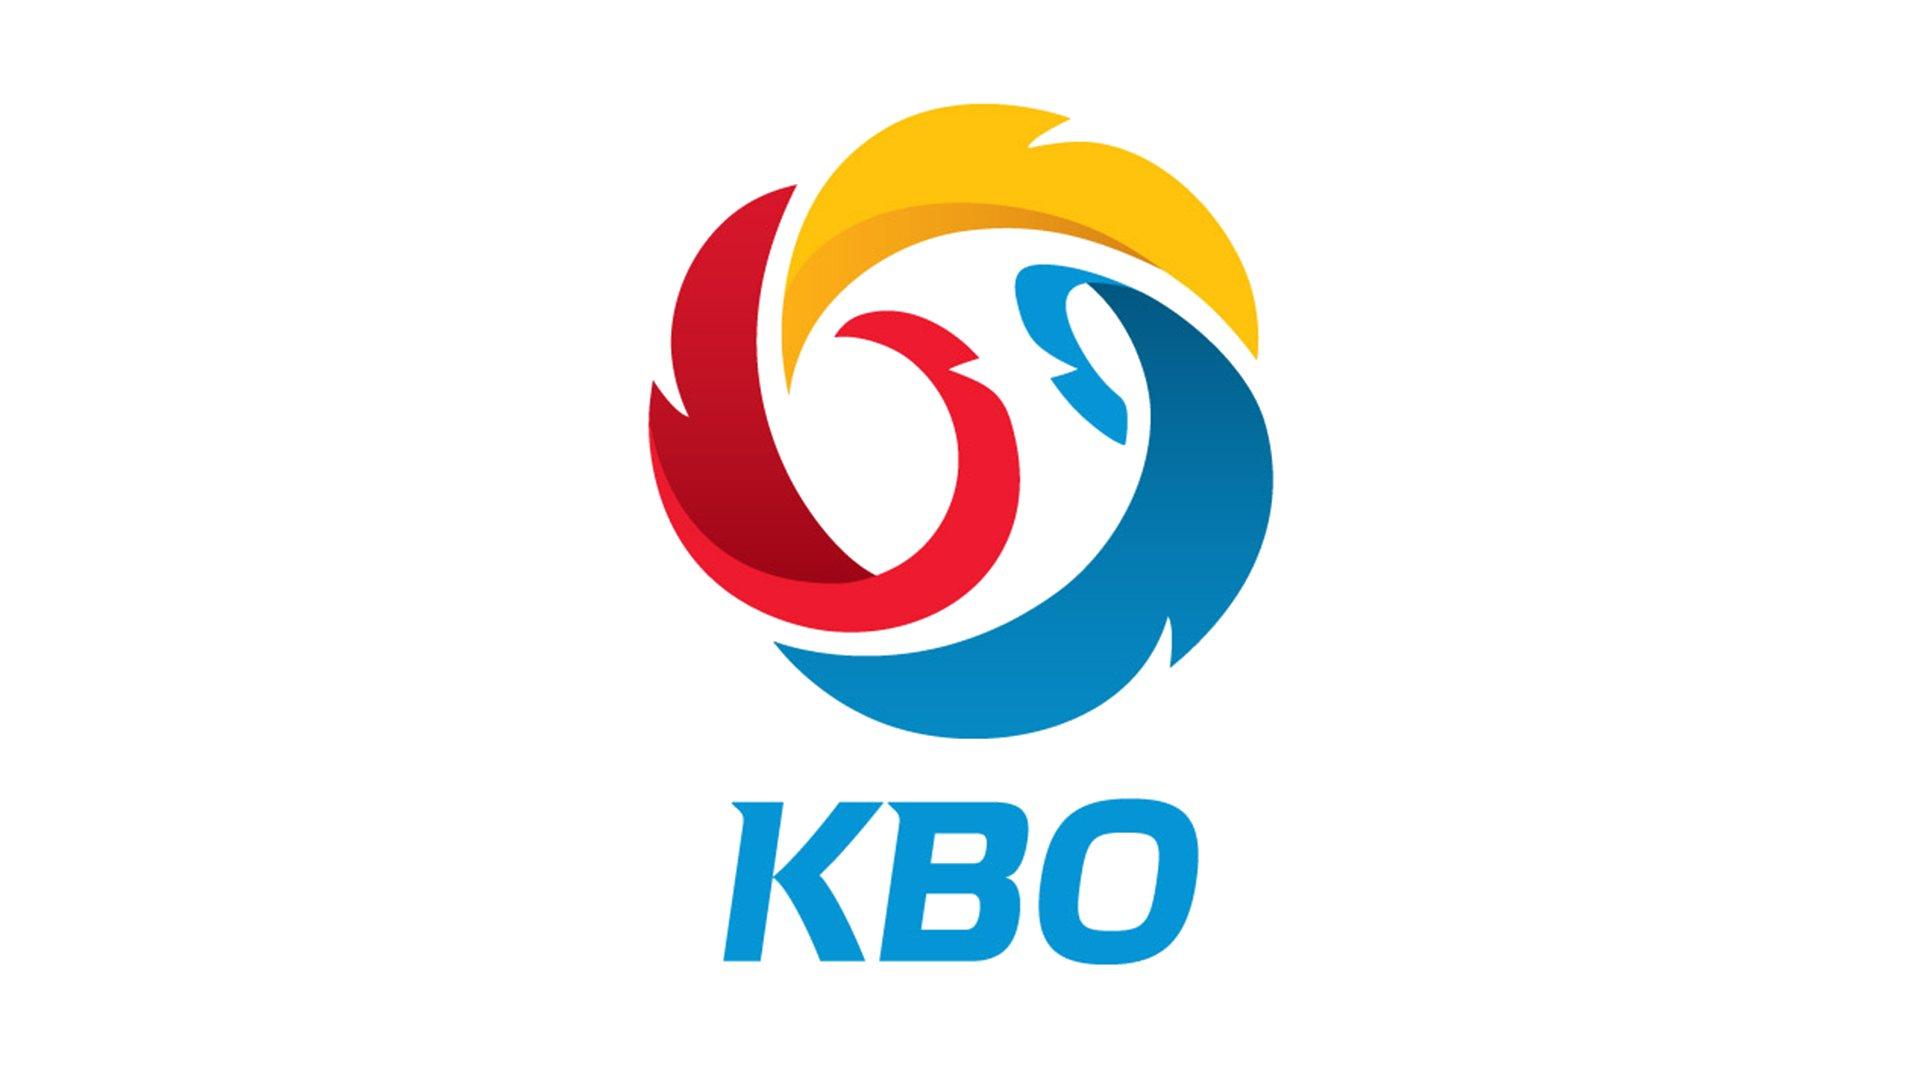 Getting to Know Korean Baseball Teams, Uniforms, and Logos